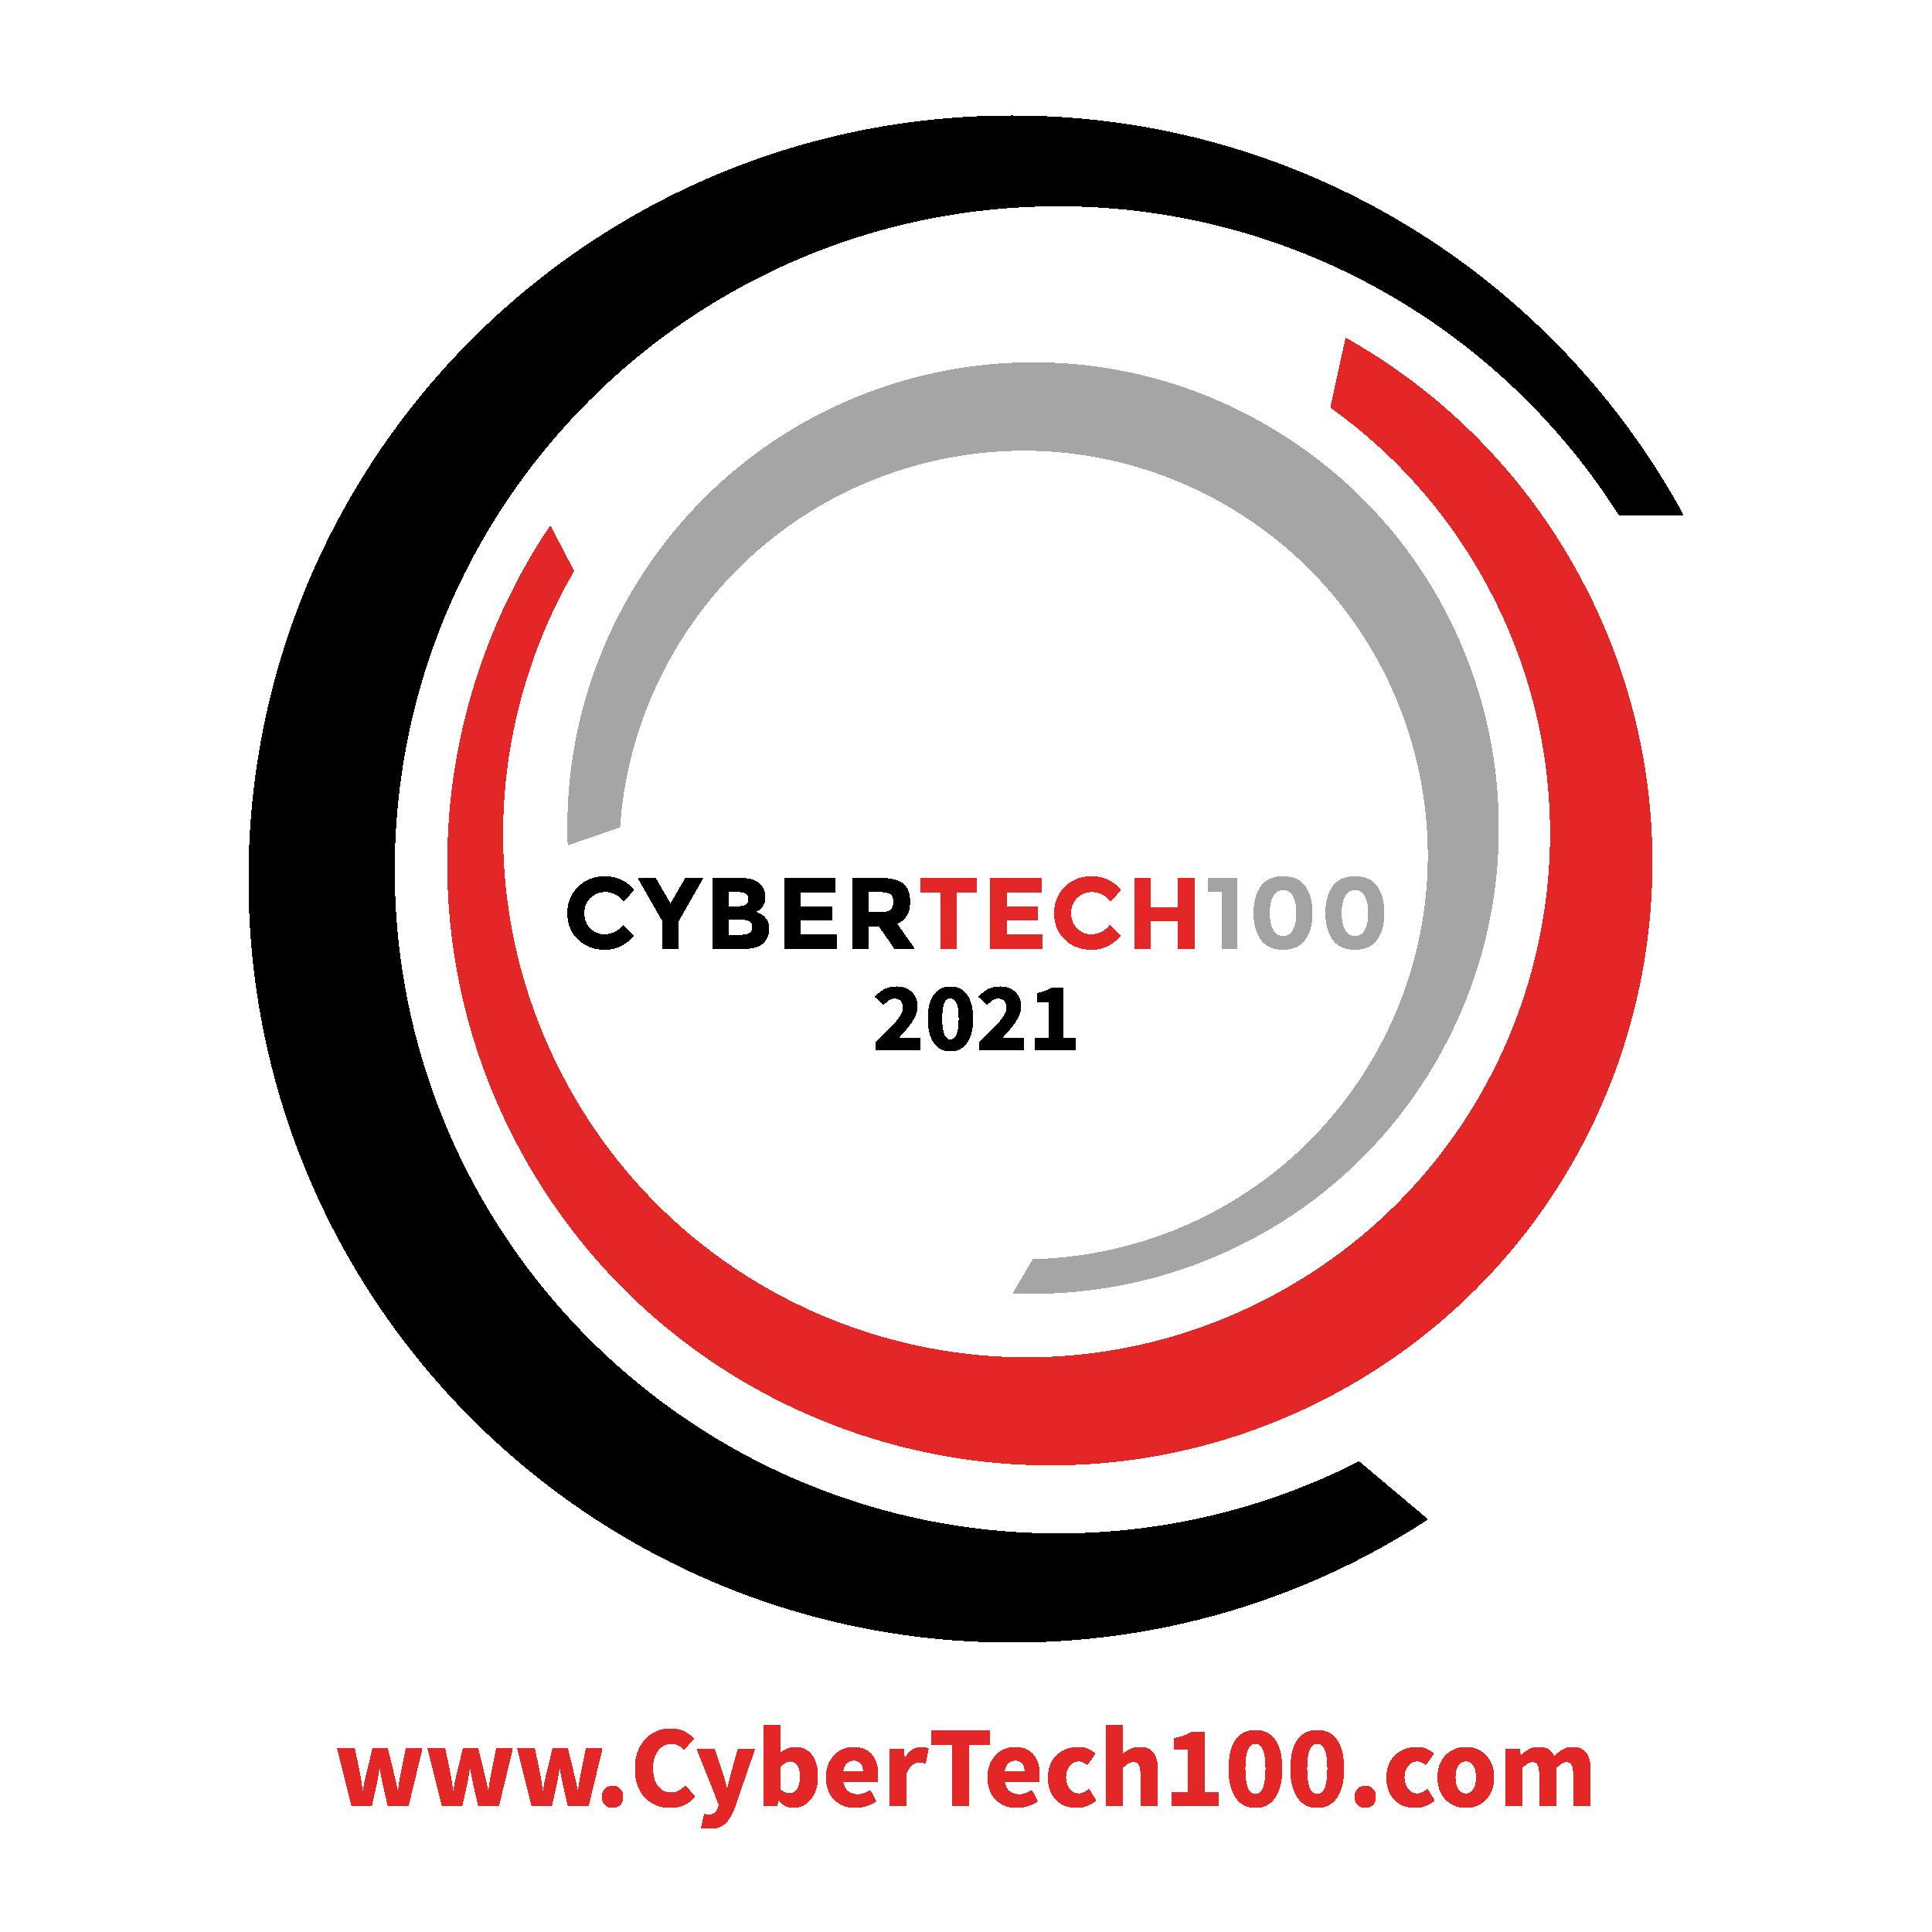 2021 Cybertech 100